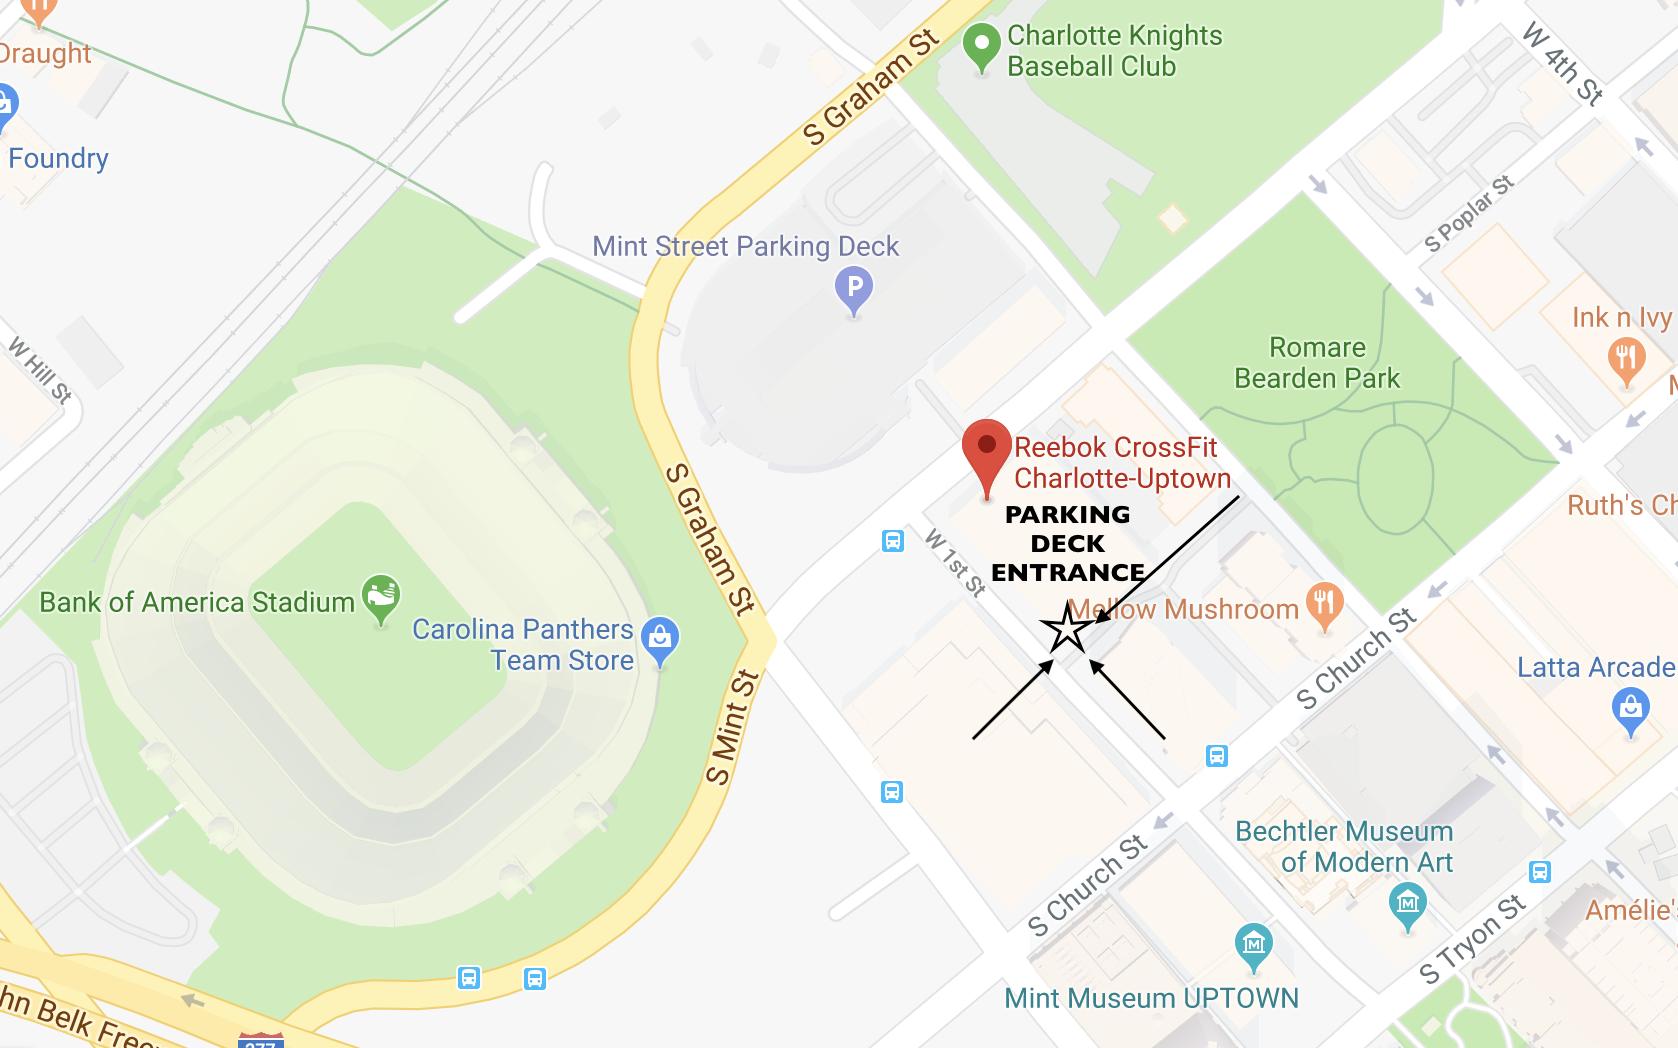 RCFC Parking deck map.png